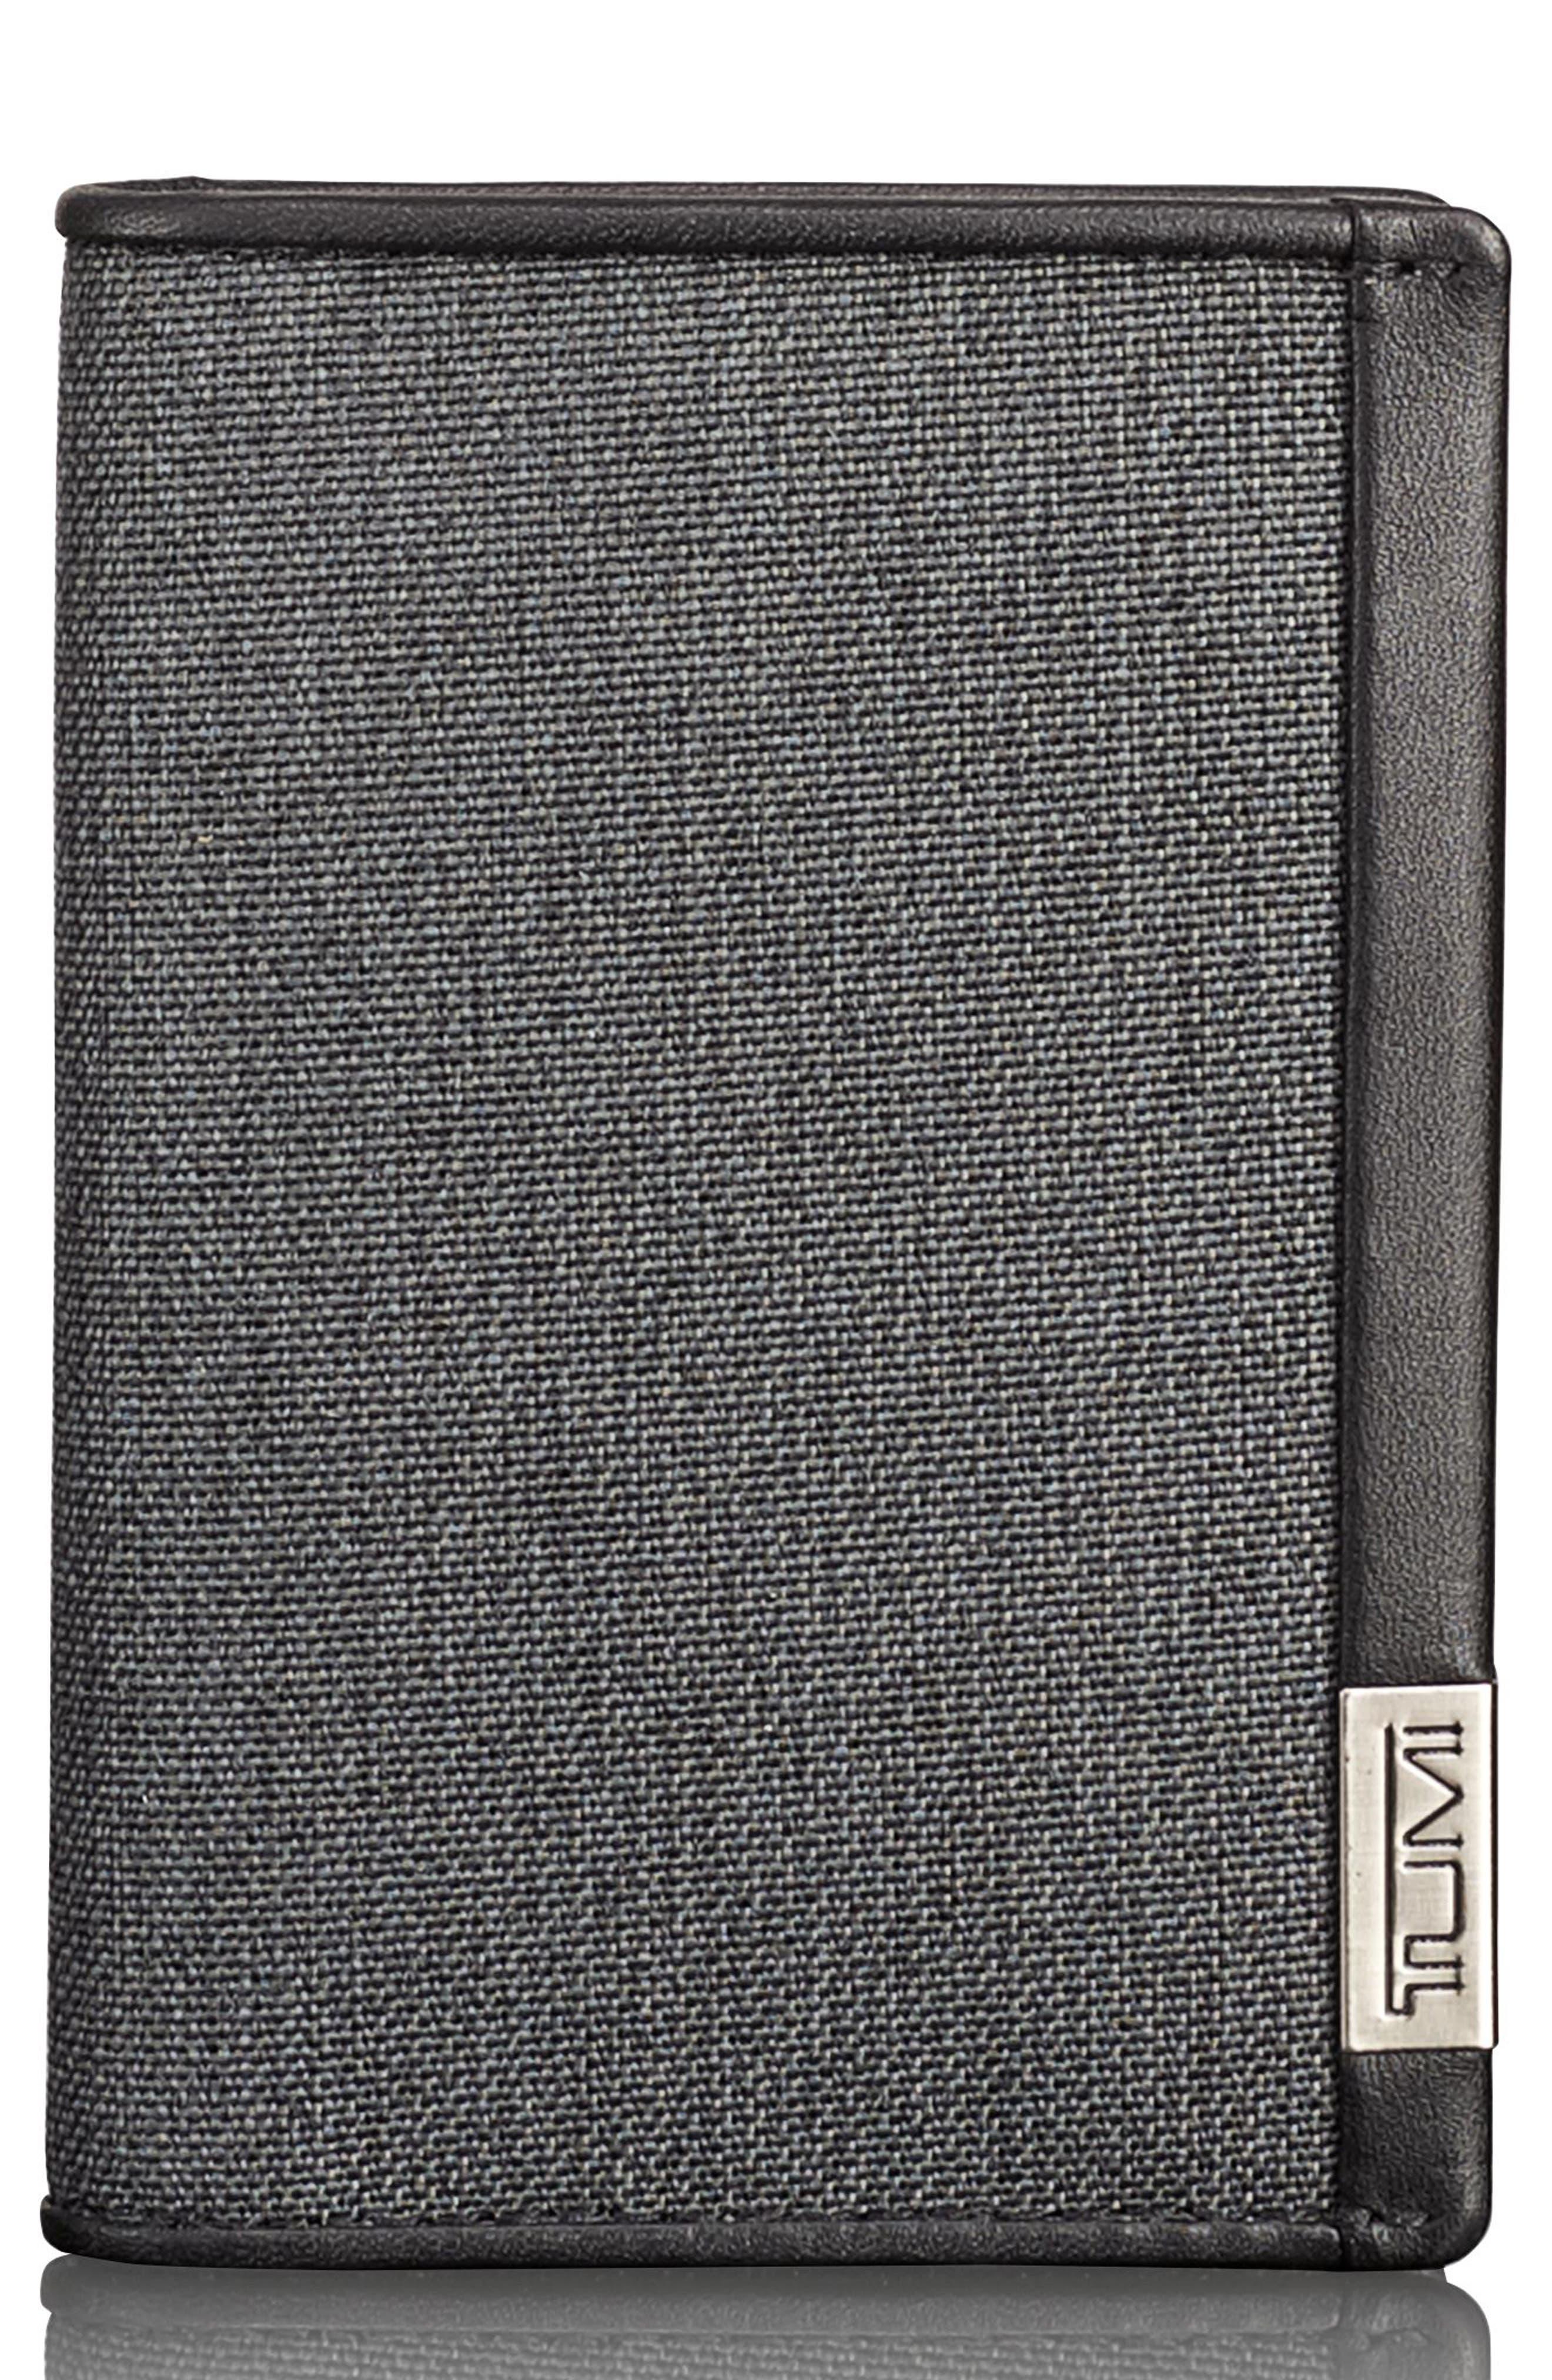 Alpha Folding Card Case,                             Main thumbnail 1, color,                             Anthracite/ Black